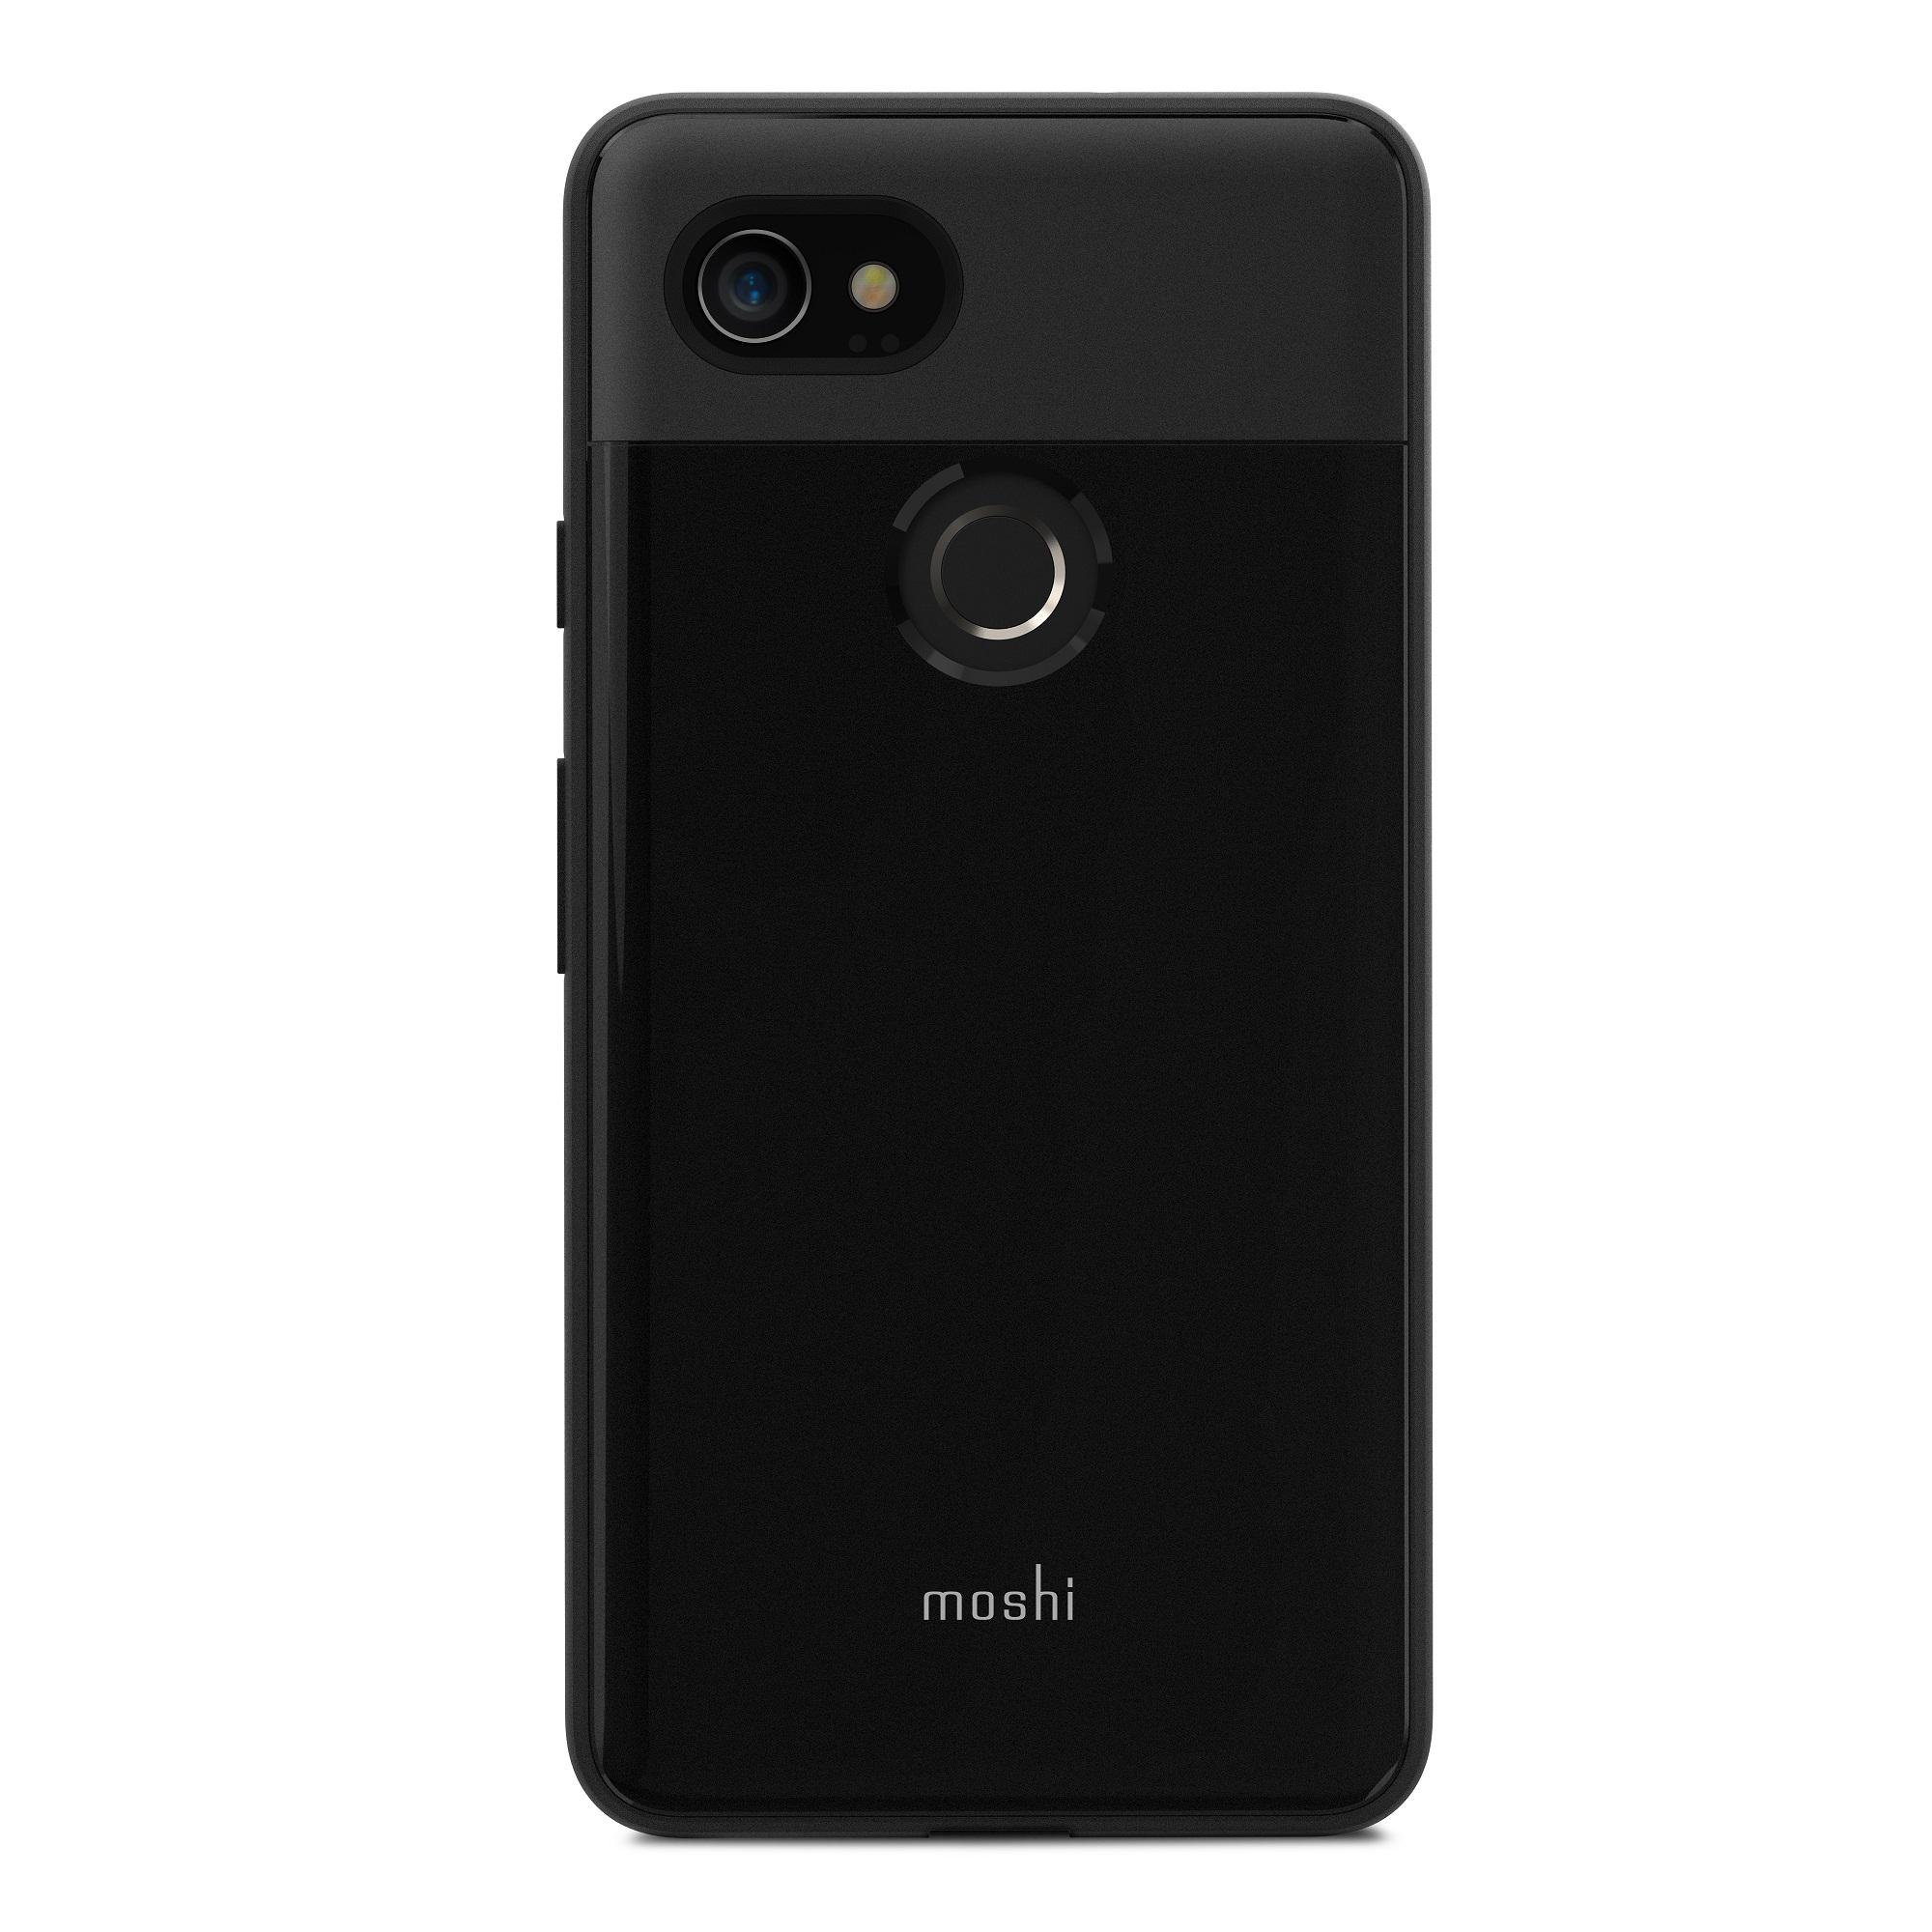 Moshi Tycho Case for Google Pixel 2 XL